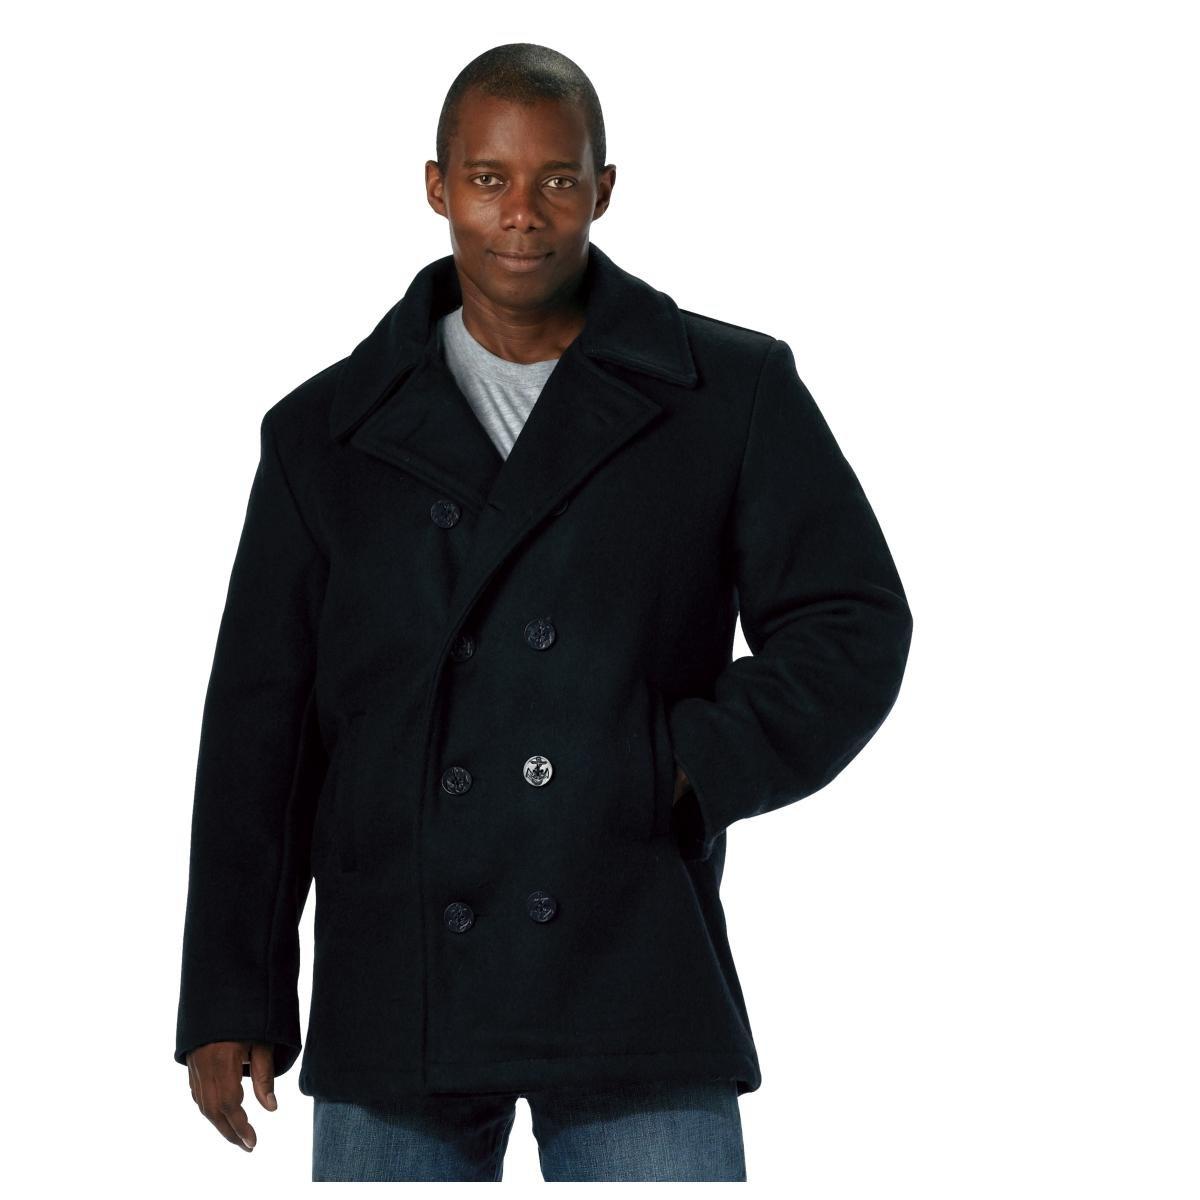 Rothco Pea Coat 707032-XSML